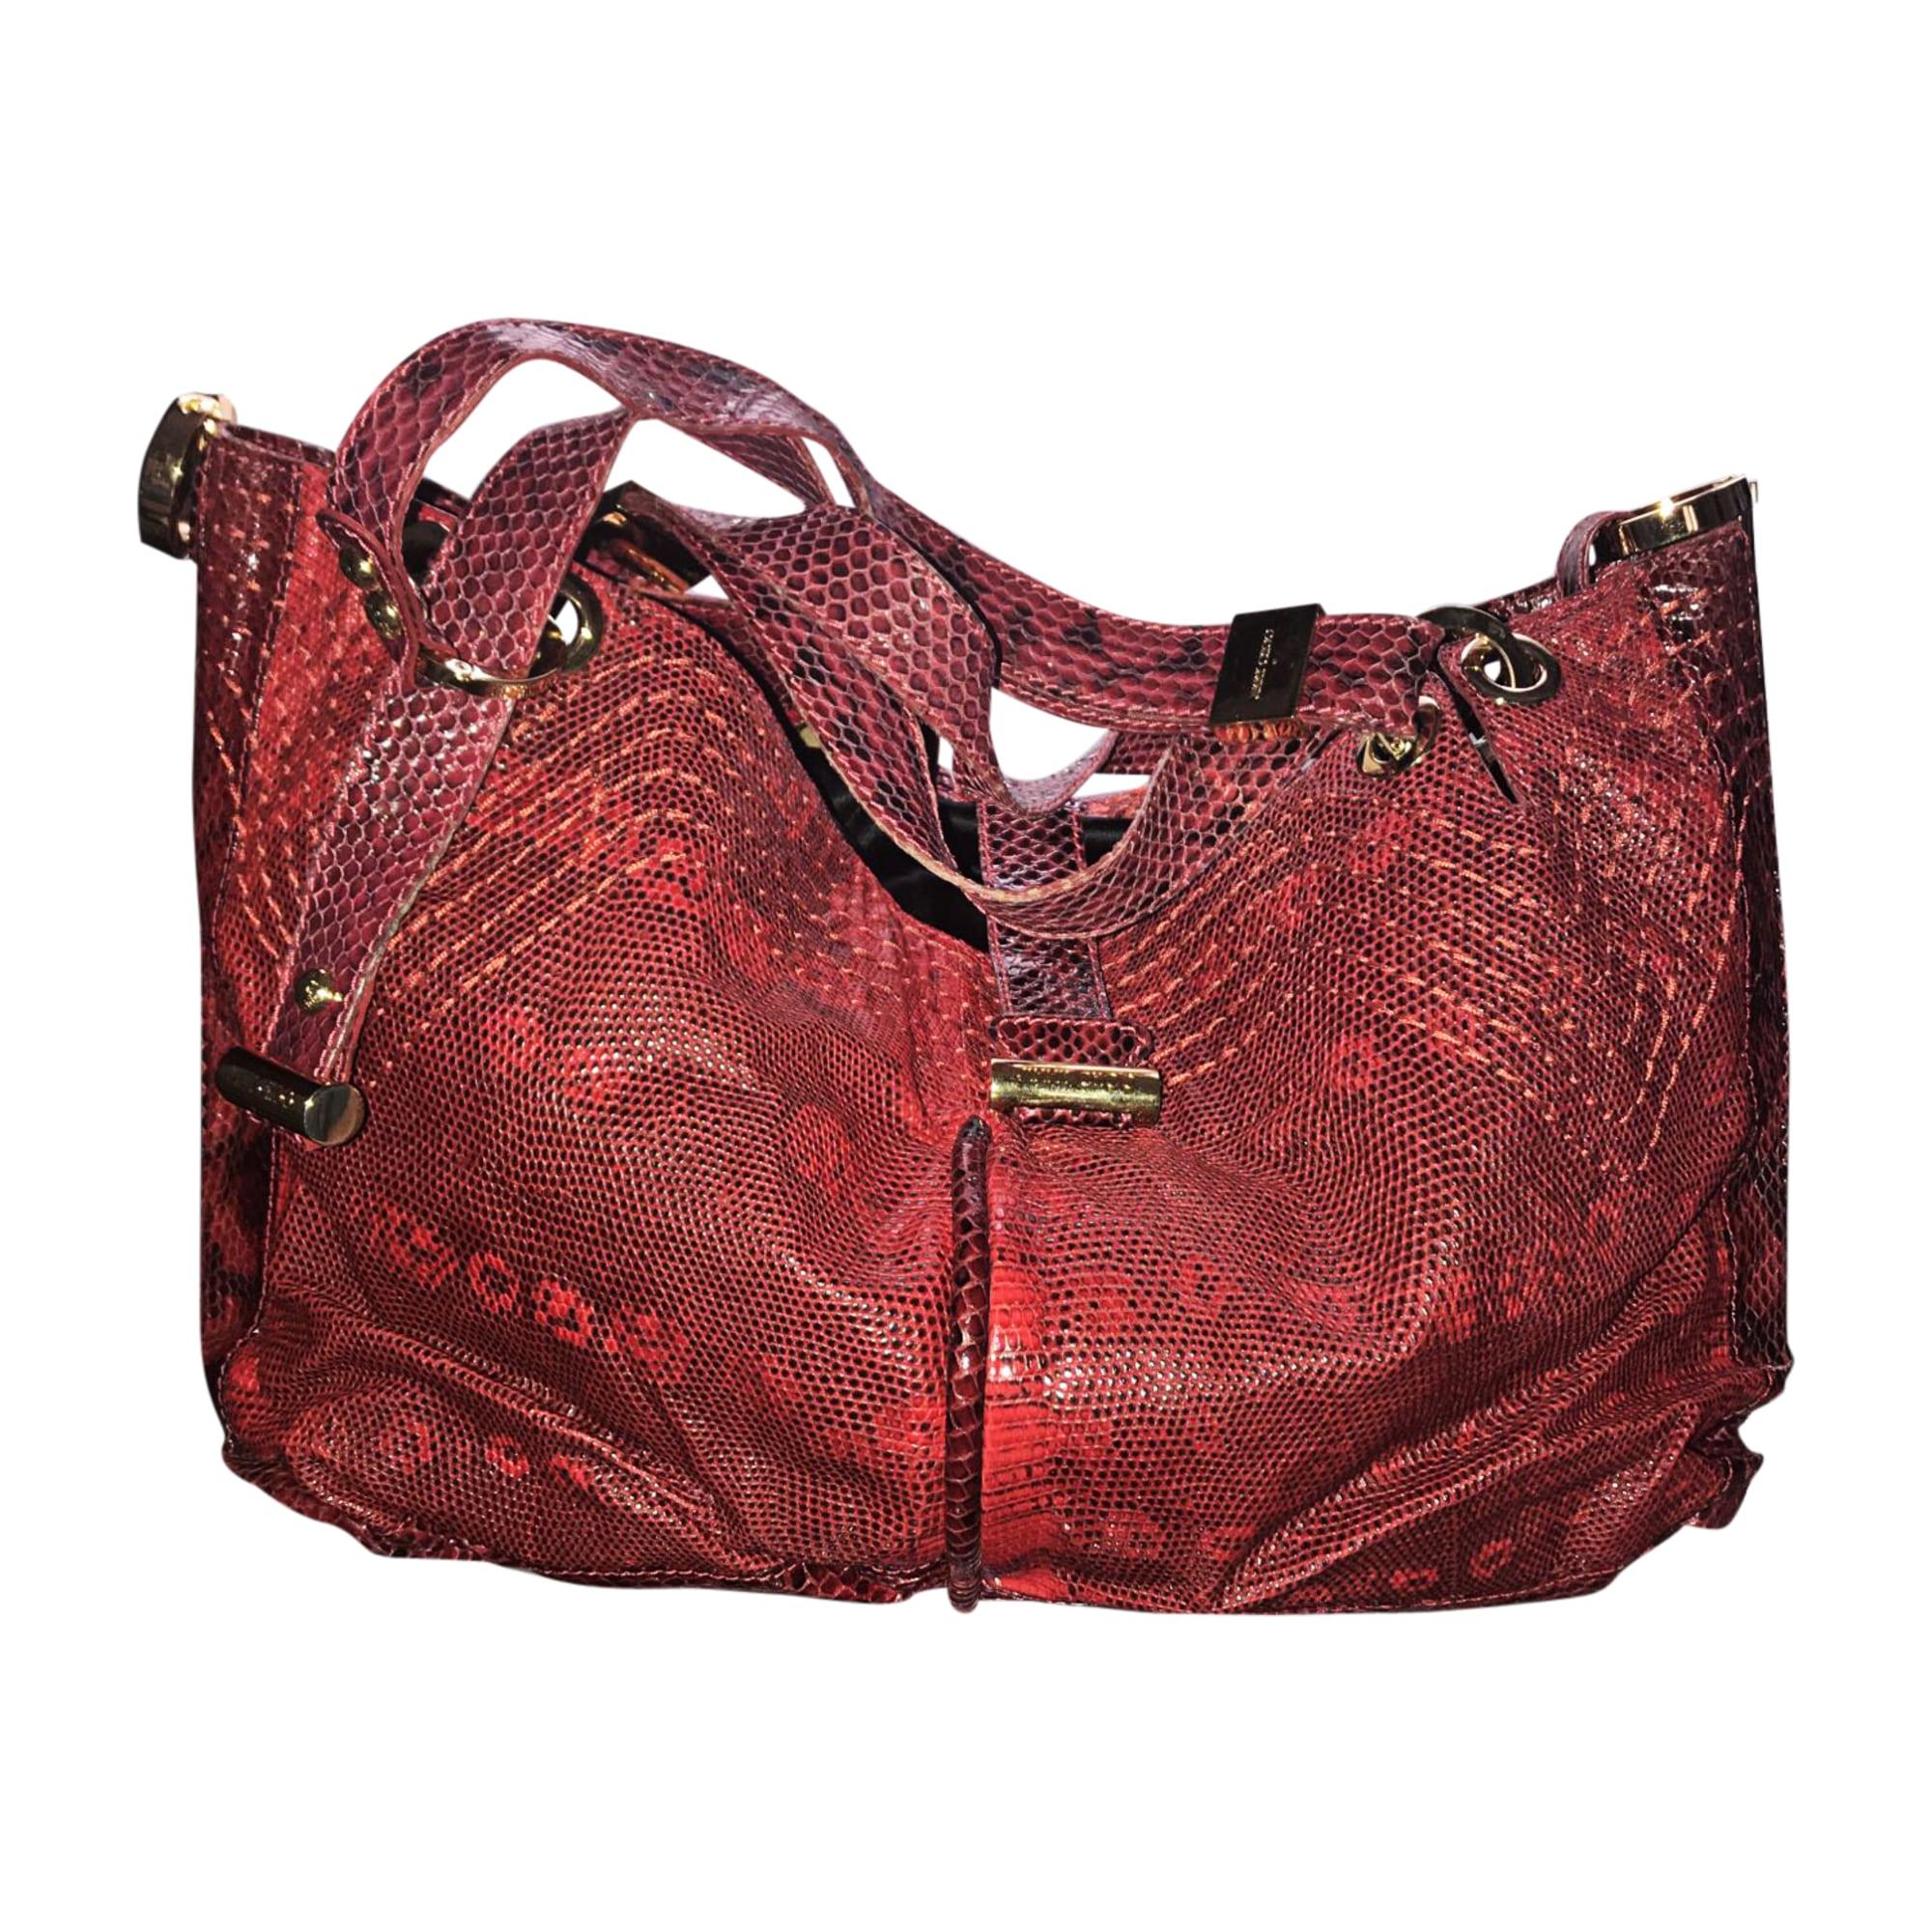 28b6dc117a10e Leather handbag jimmy choo red burgundy jpg 2000x2000 Choo handbags